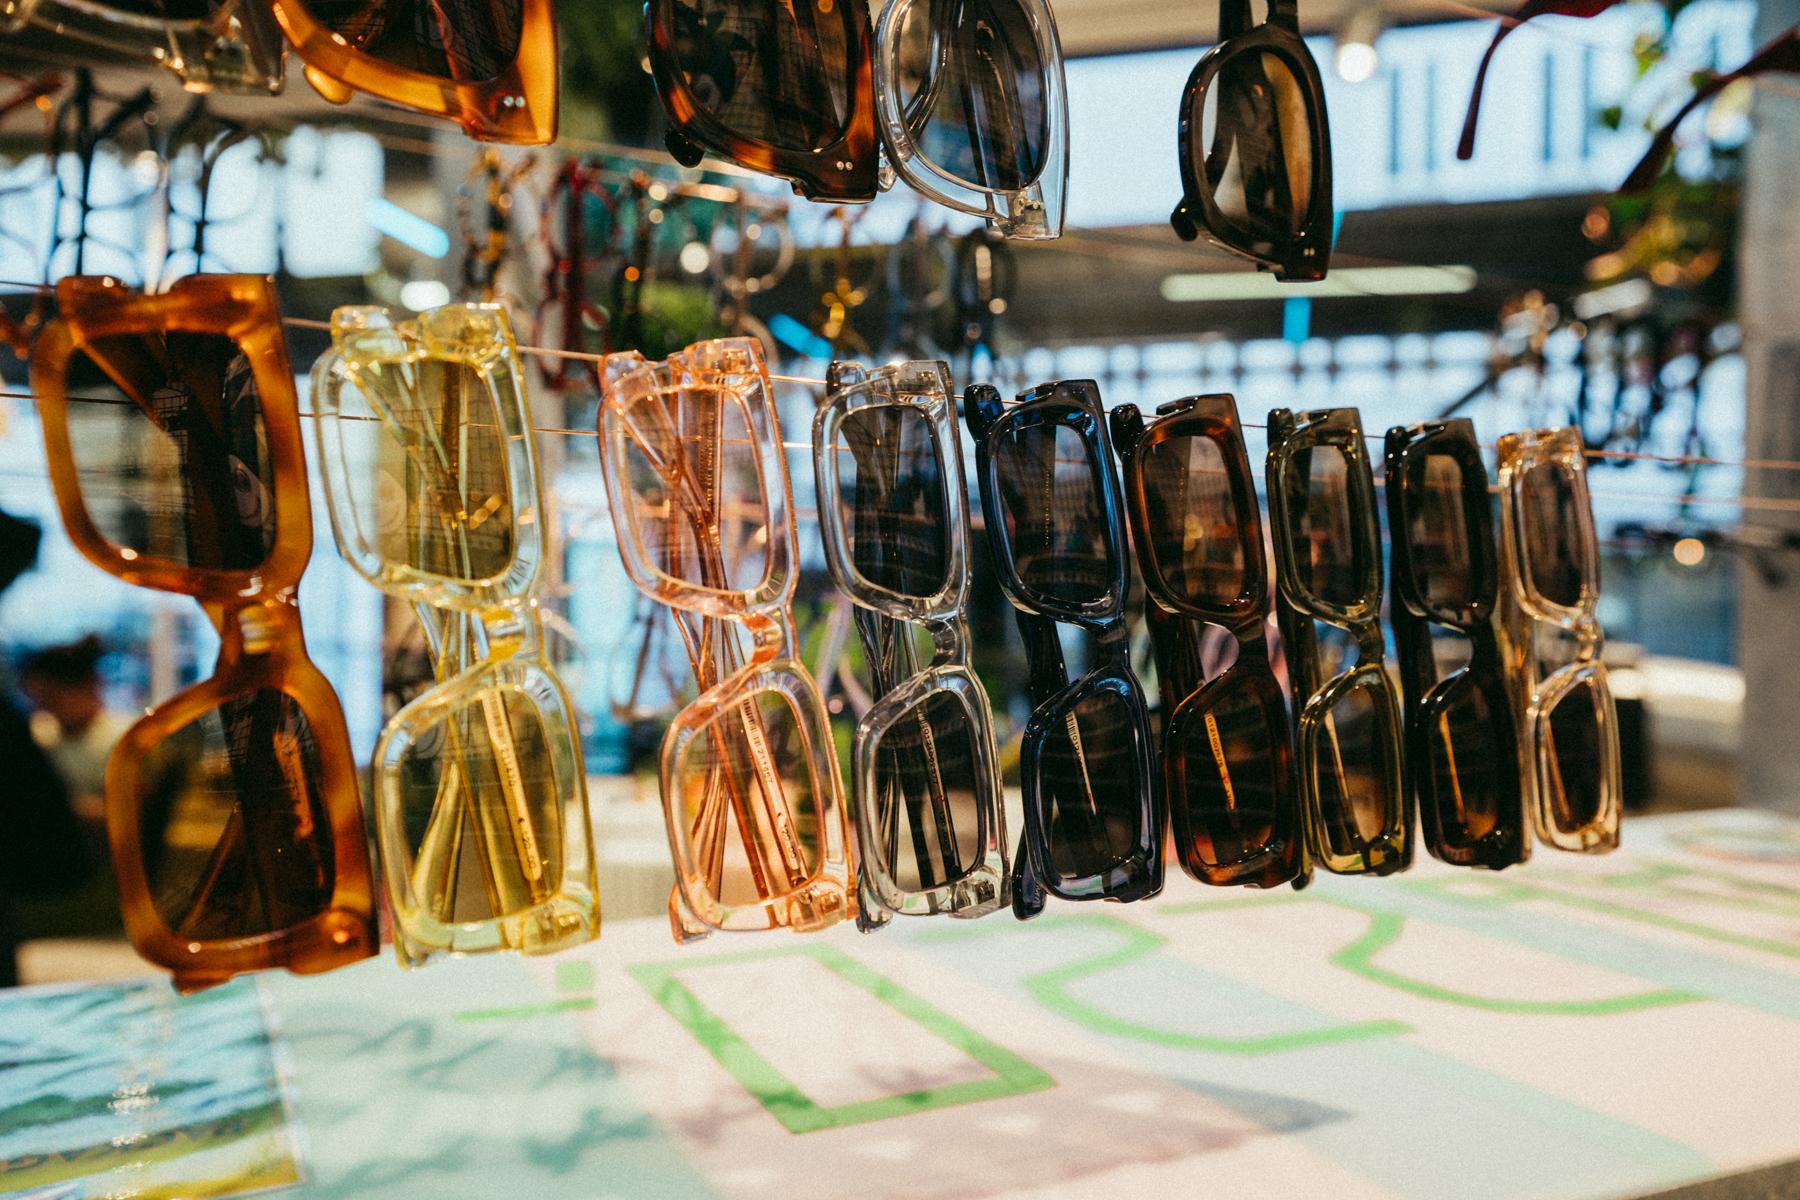 Gtm Toxtox Brillen Schwabing Ag 01 – ©wunderland media GmbH